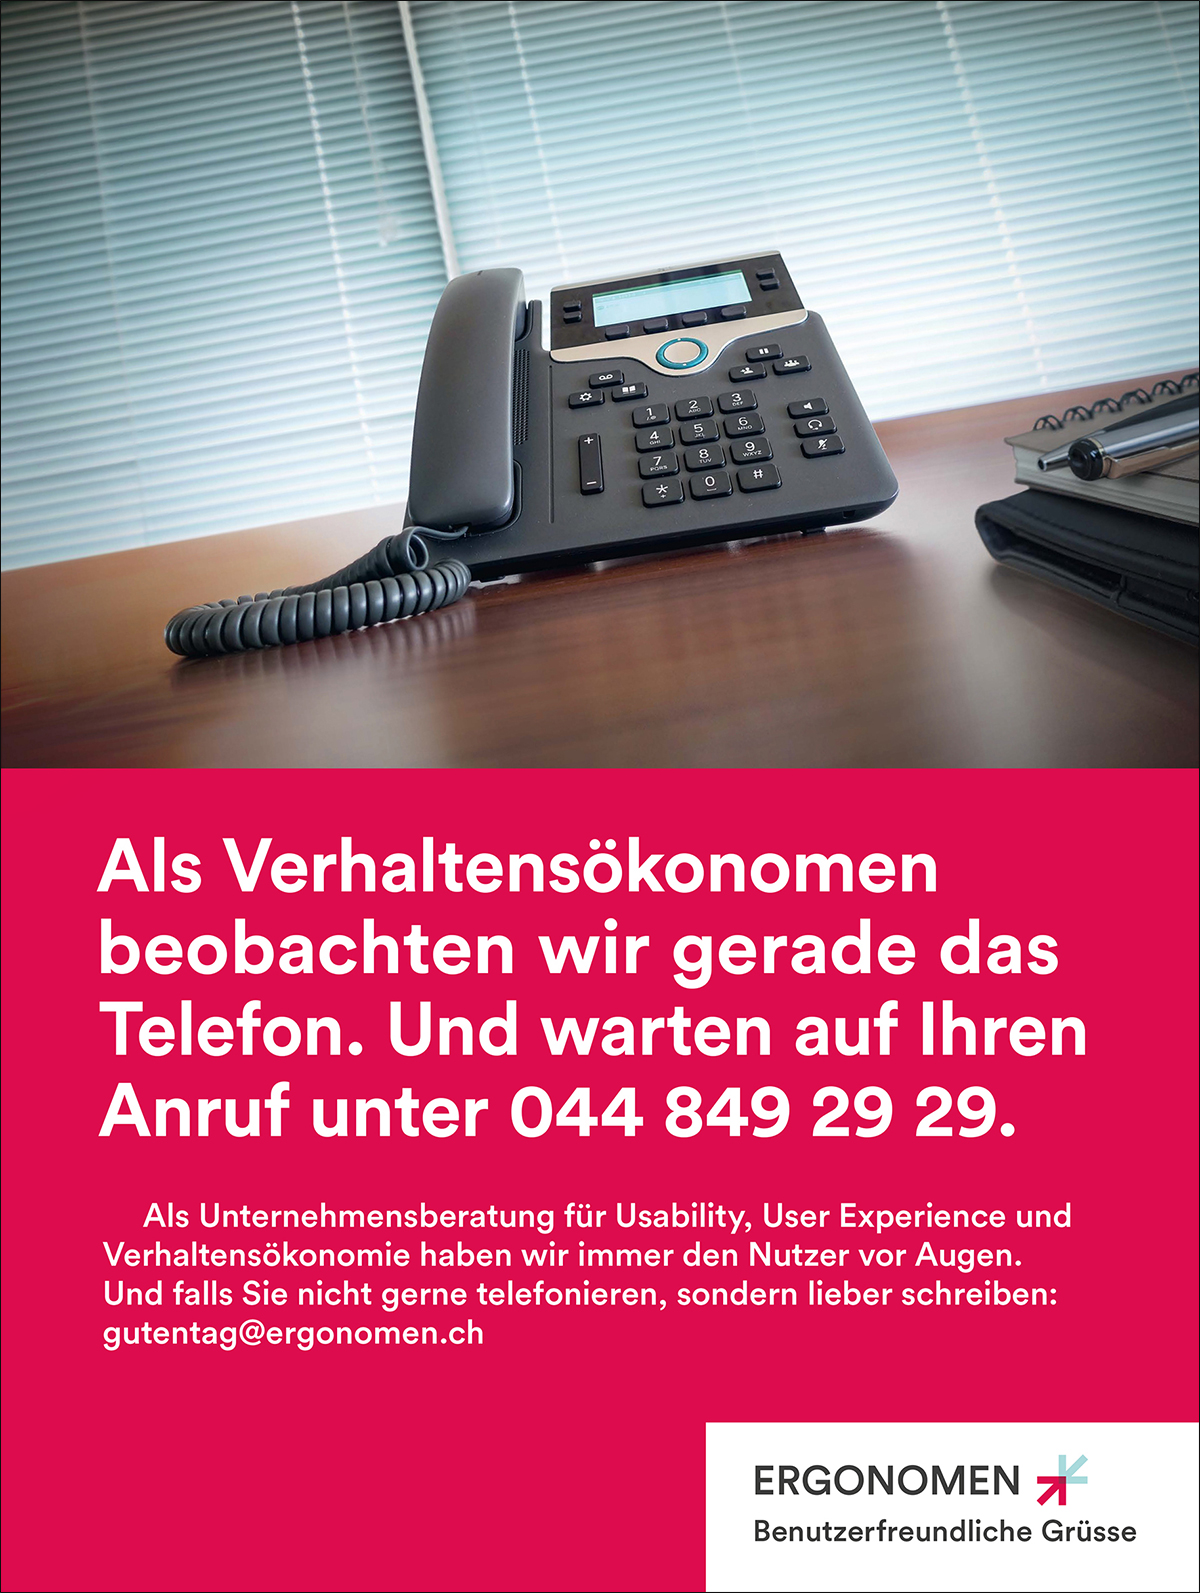 02-Ergonomen_Inserat_Telefon